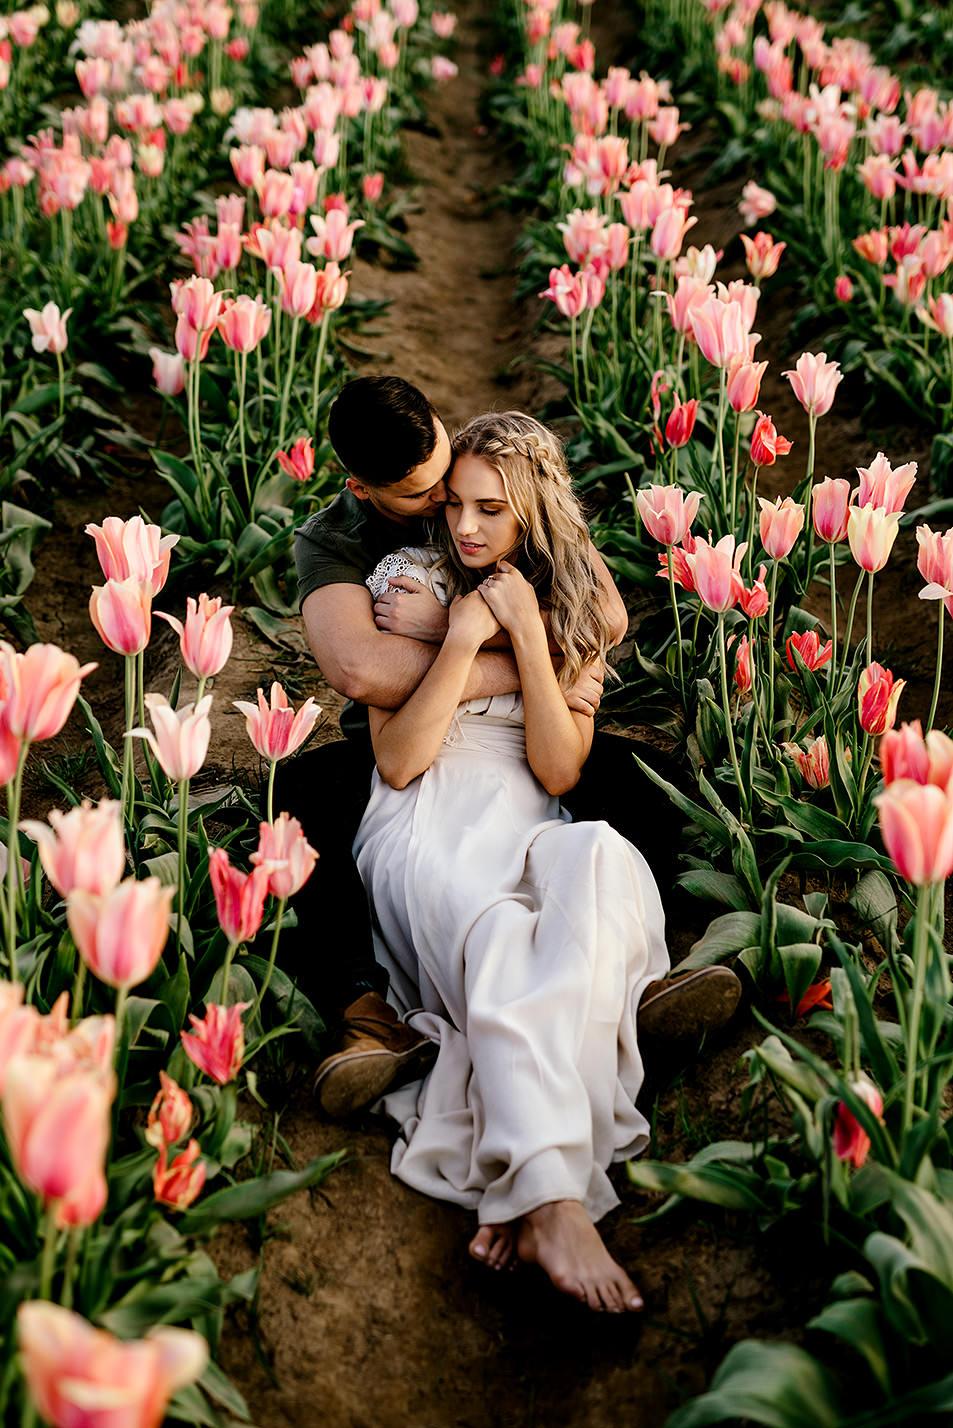 Tulip-field-engagement-session-Portland-Photographer-24.jpg